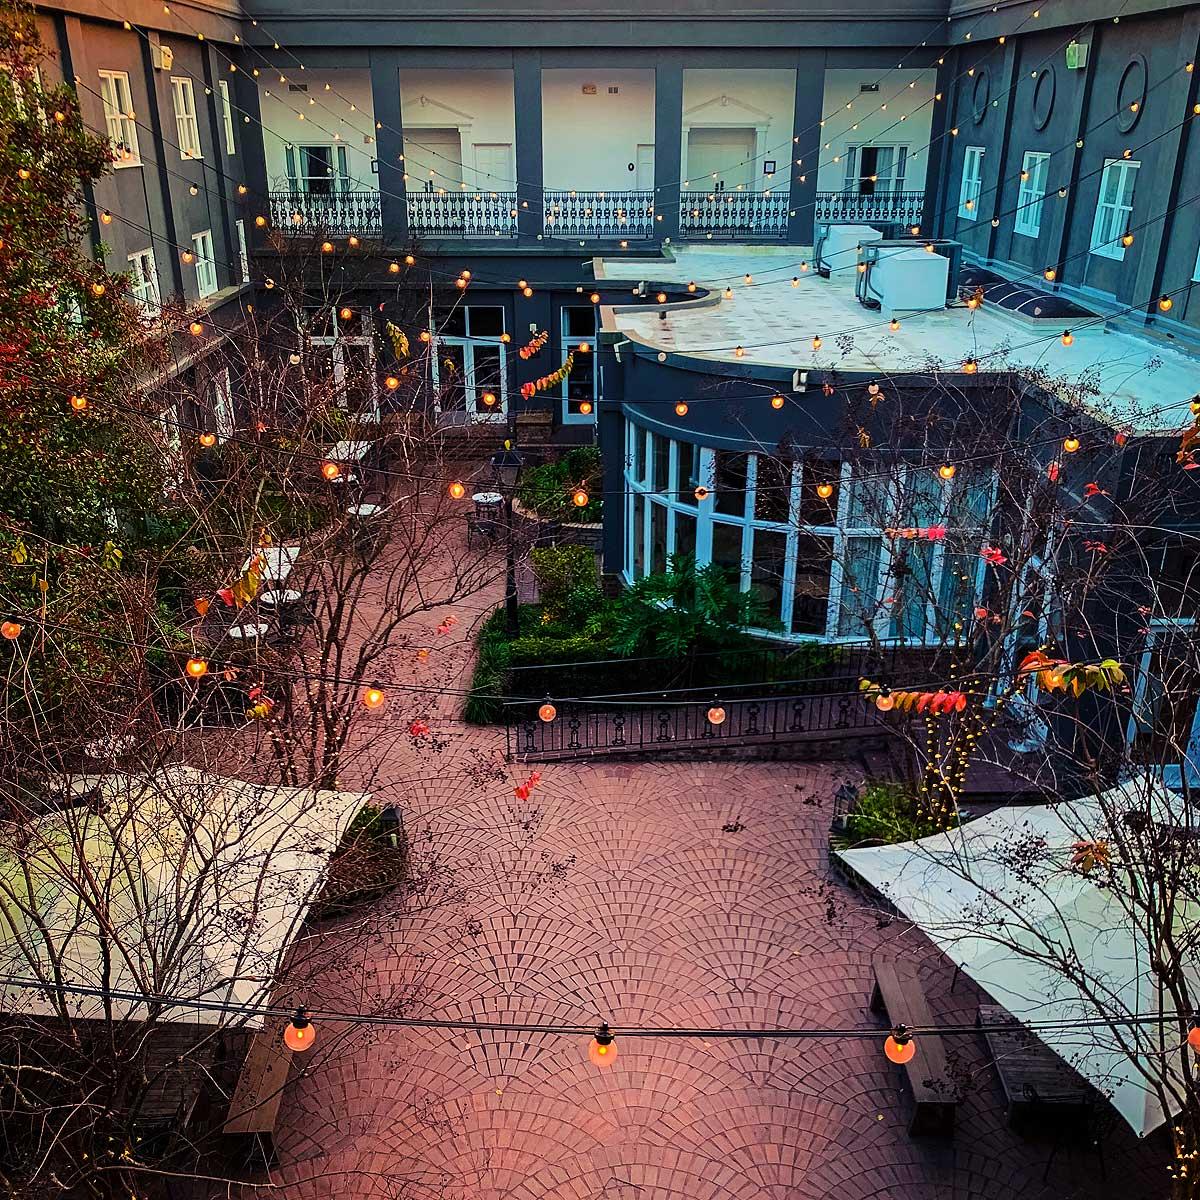 Fairy lights criss-crossing the Kimpton Brice Hotel courtyard